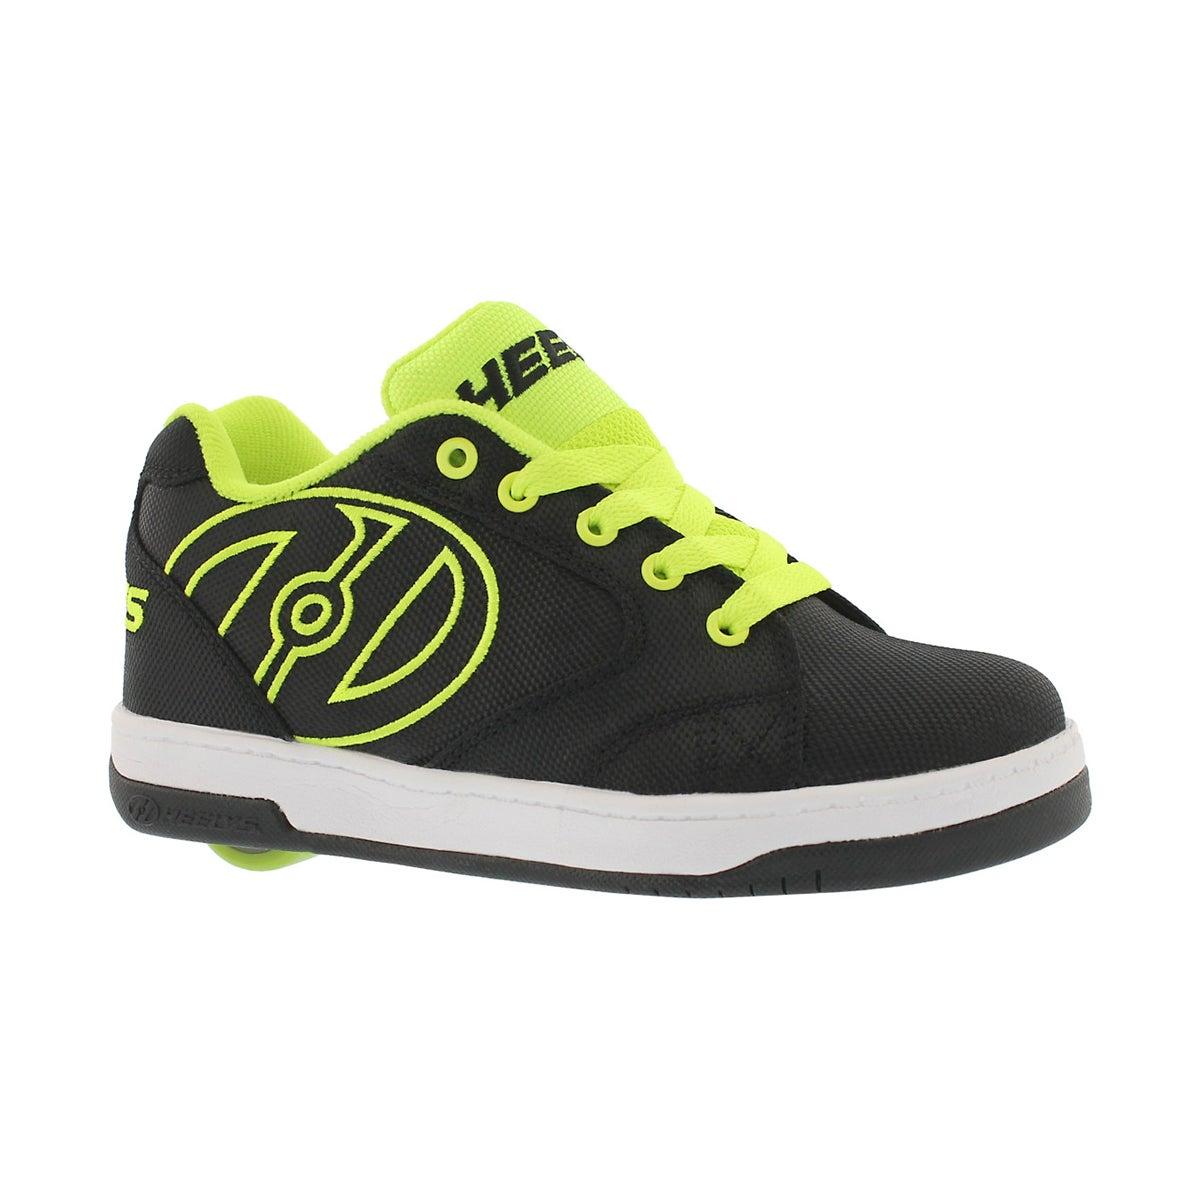 Boys' PROPEL 2.0 black/yellow skate sneakers